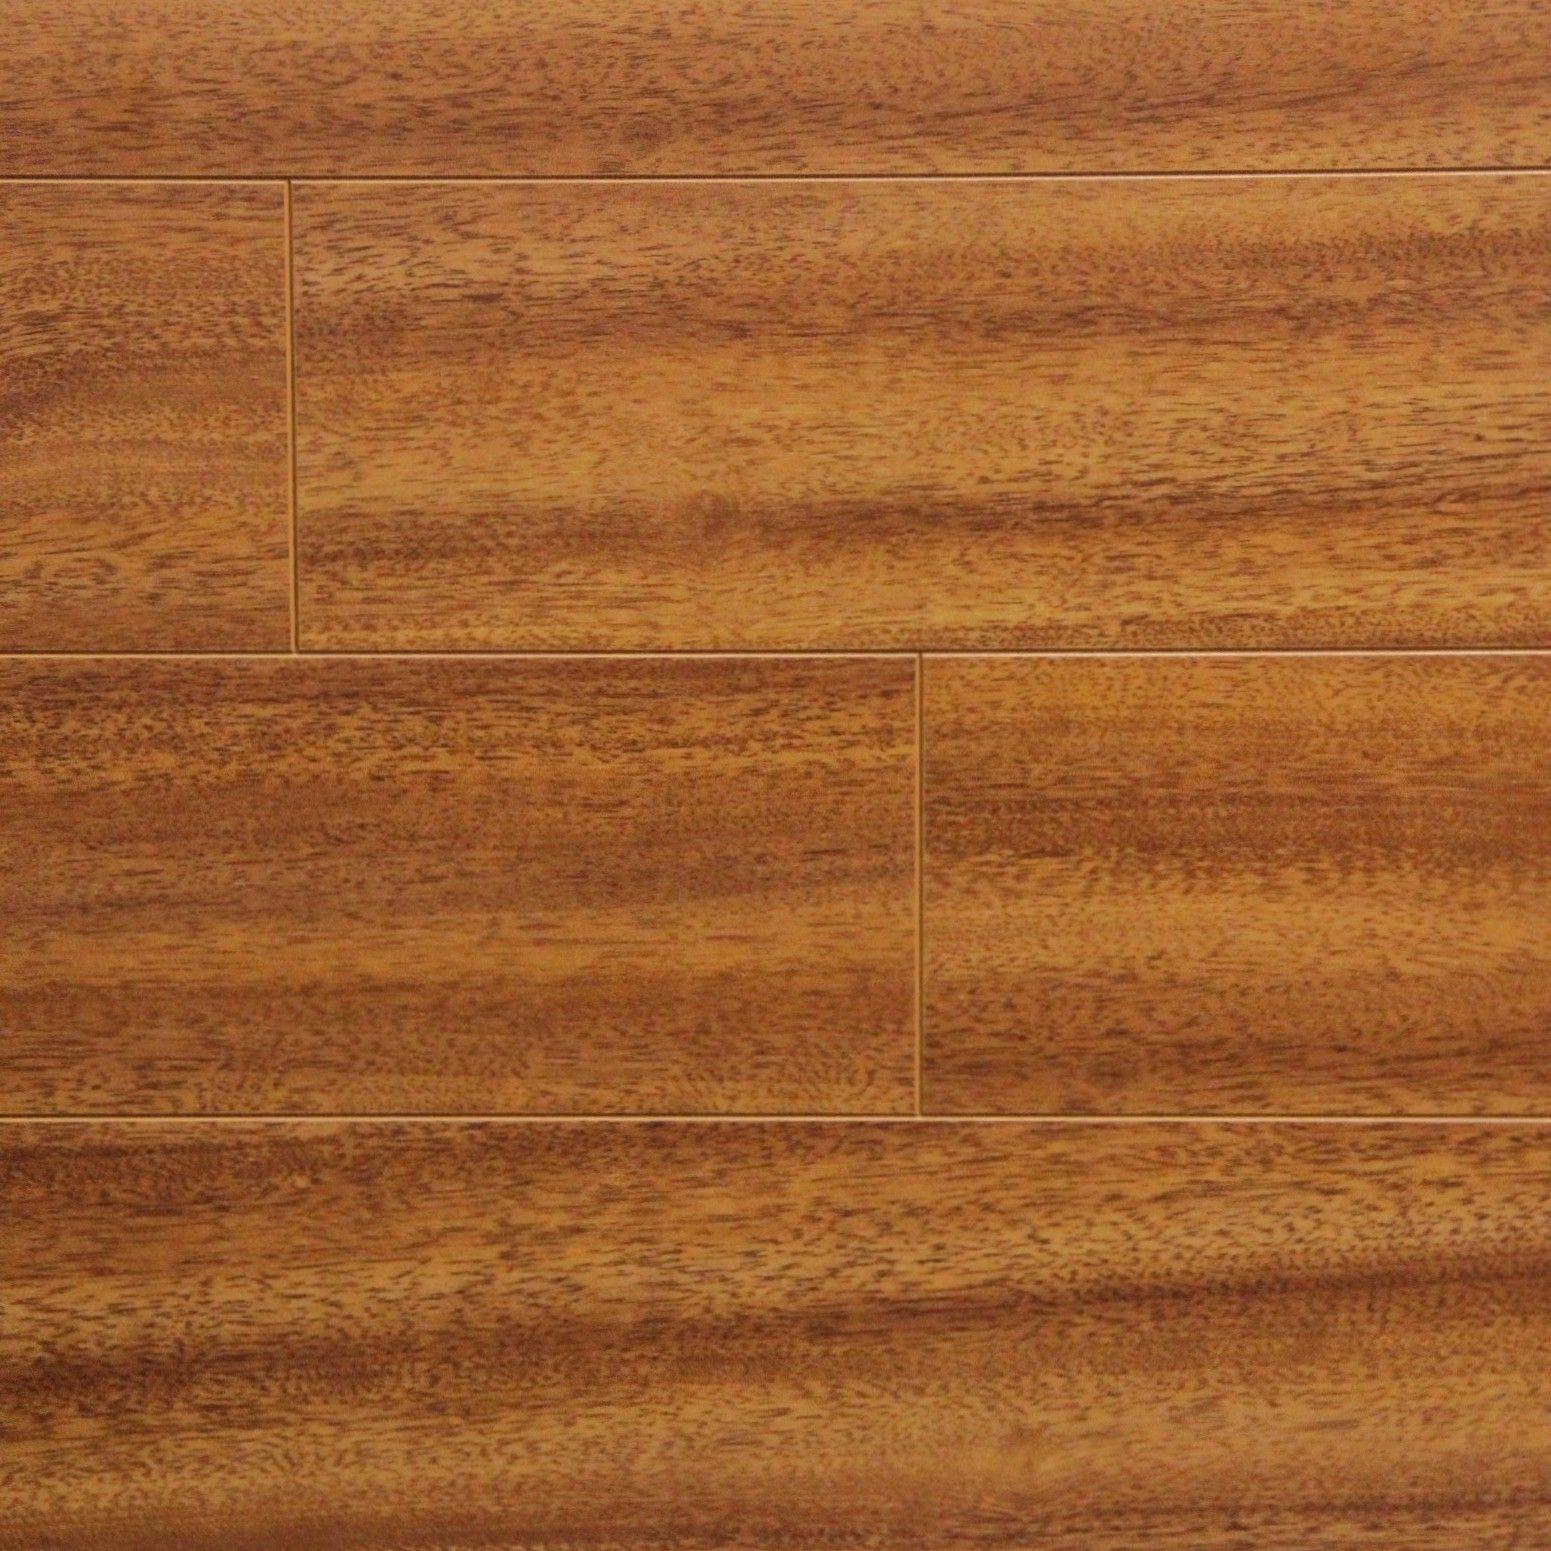 Laminate Flooring, Where Is Serradon Laminate Flooring Made